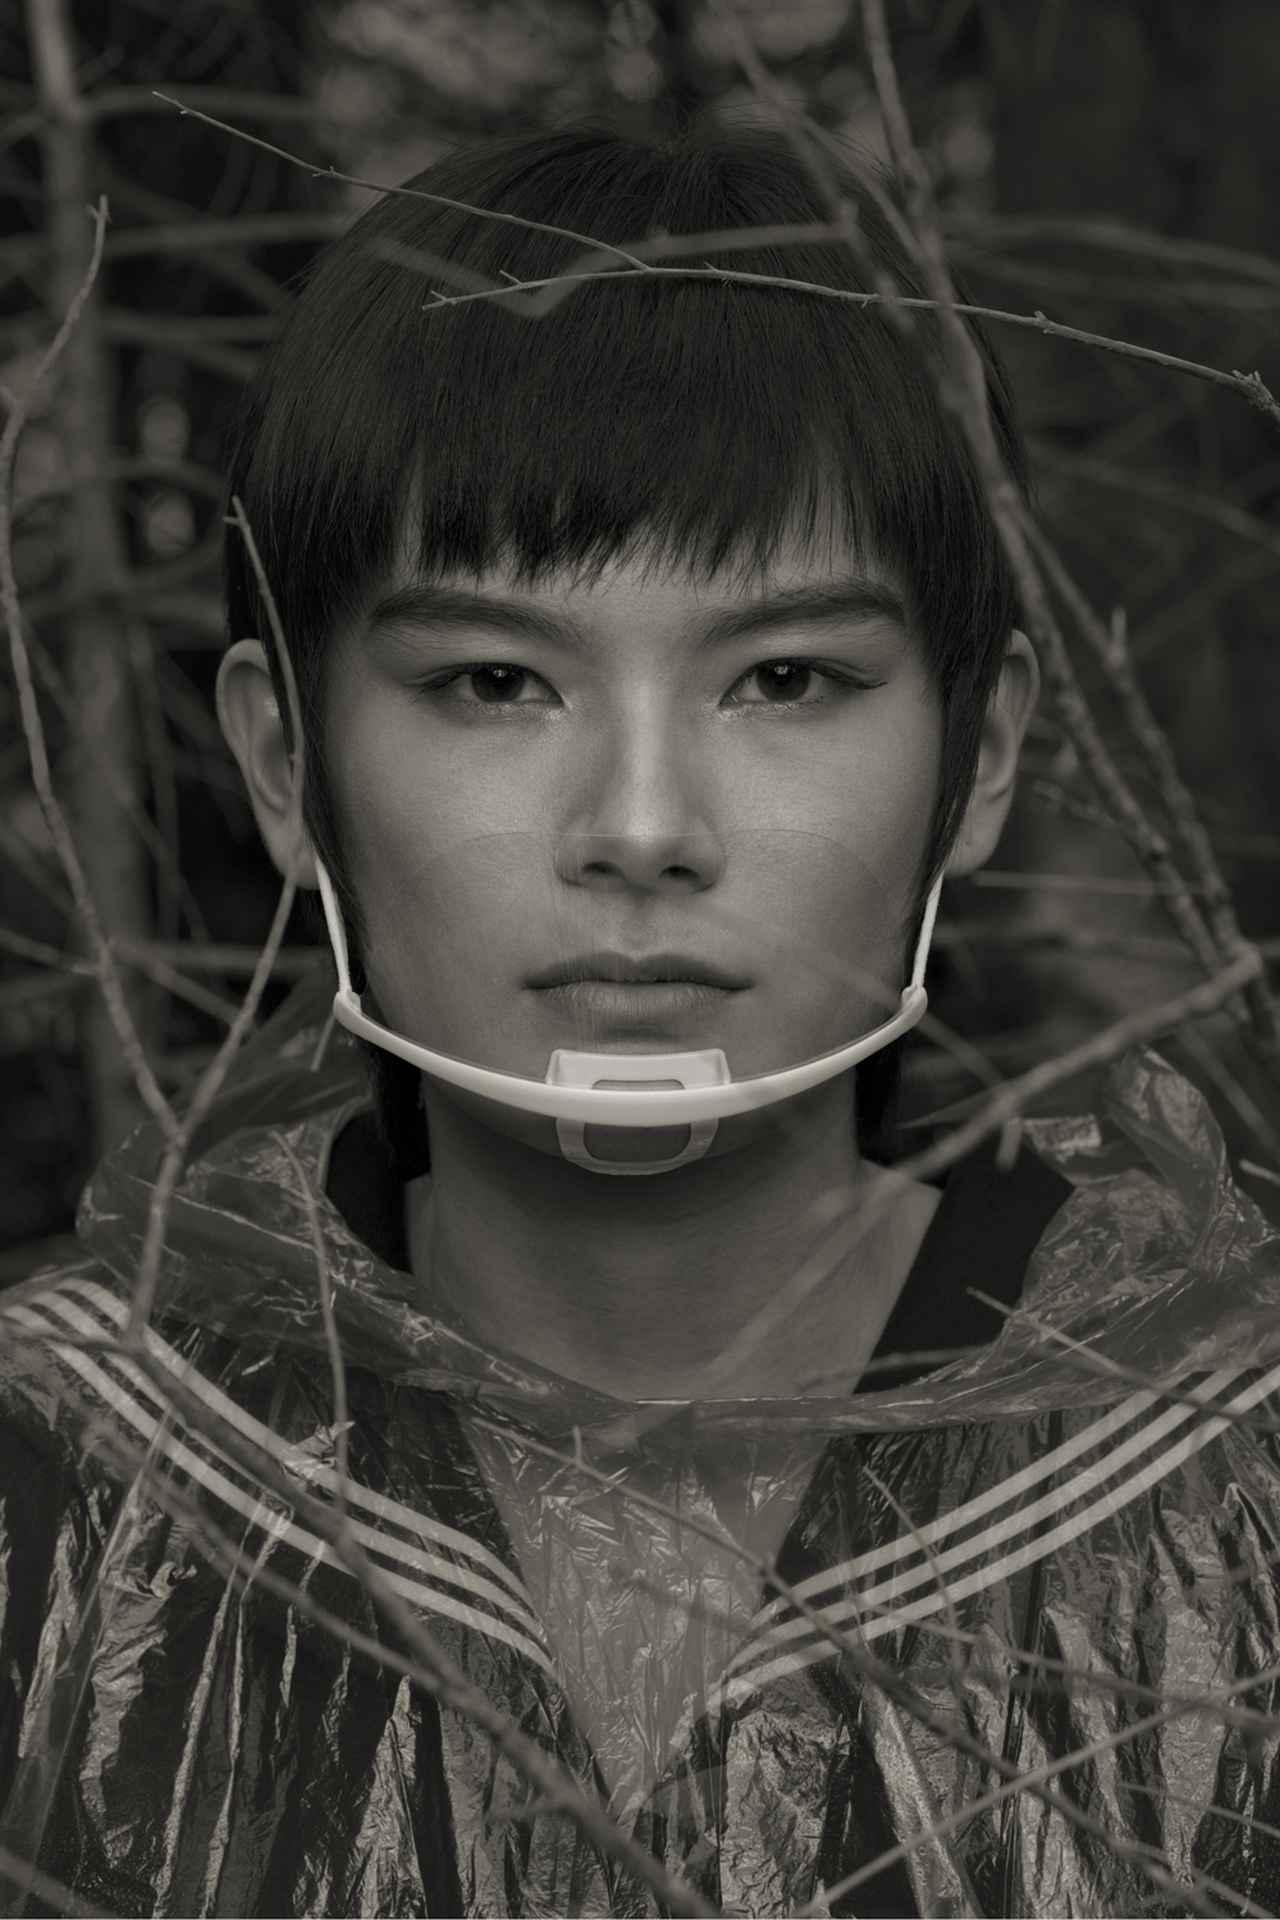 画像: Im Wald, Porträt VII, 2020 © Erwin Oraf